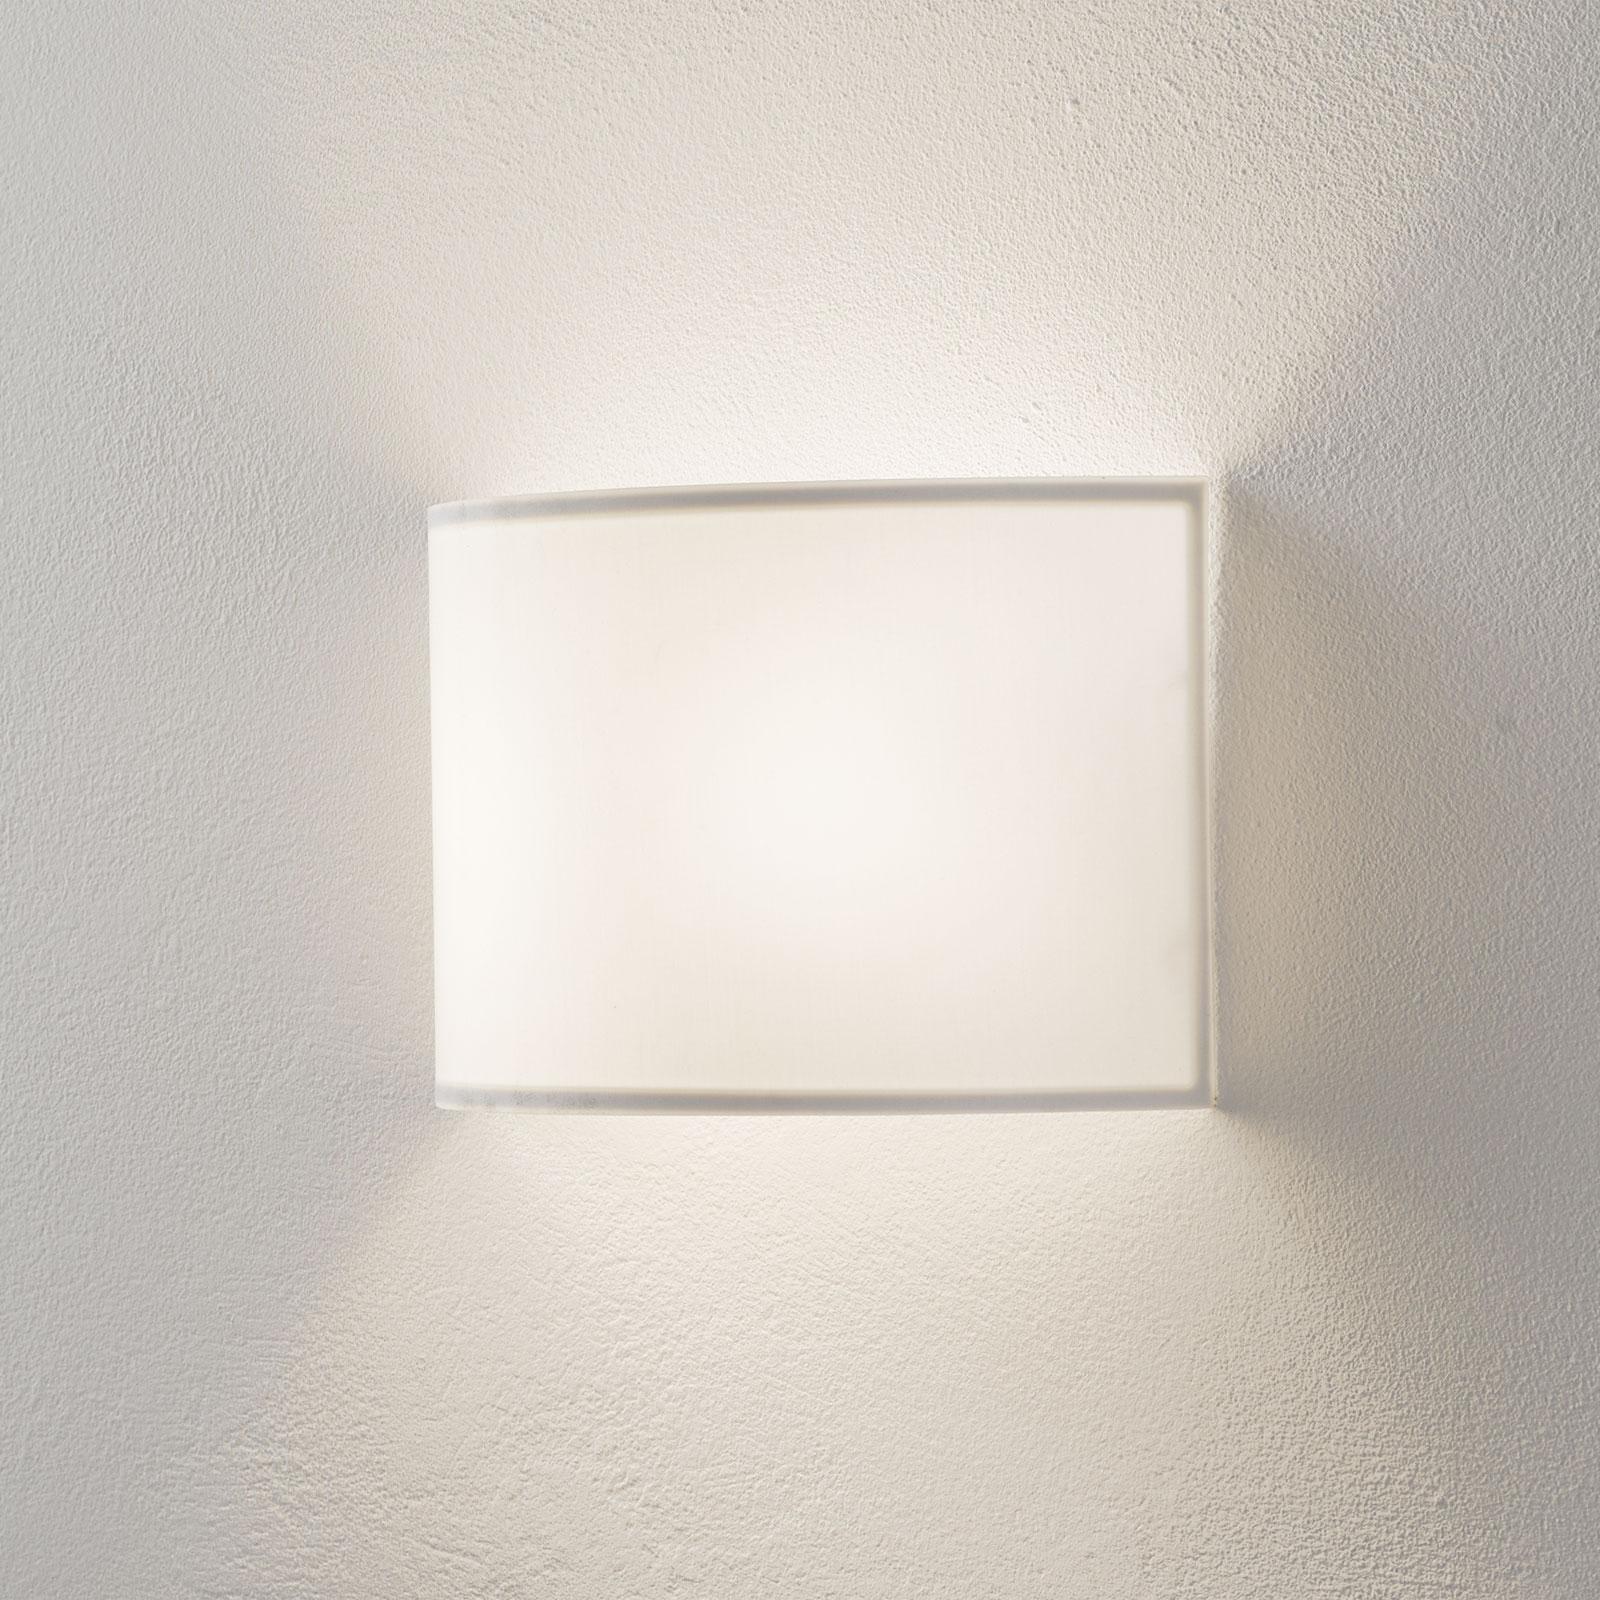 Lucande Patrik wandlamp halfrond 19cm wit